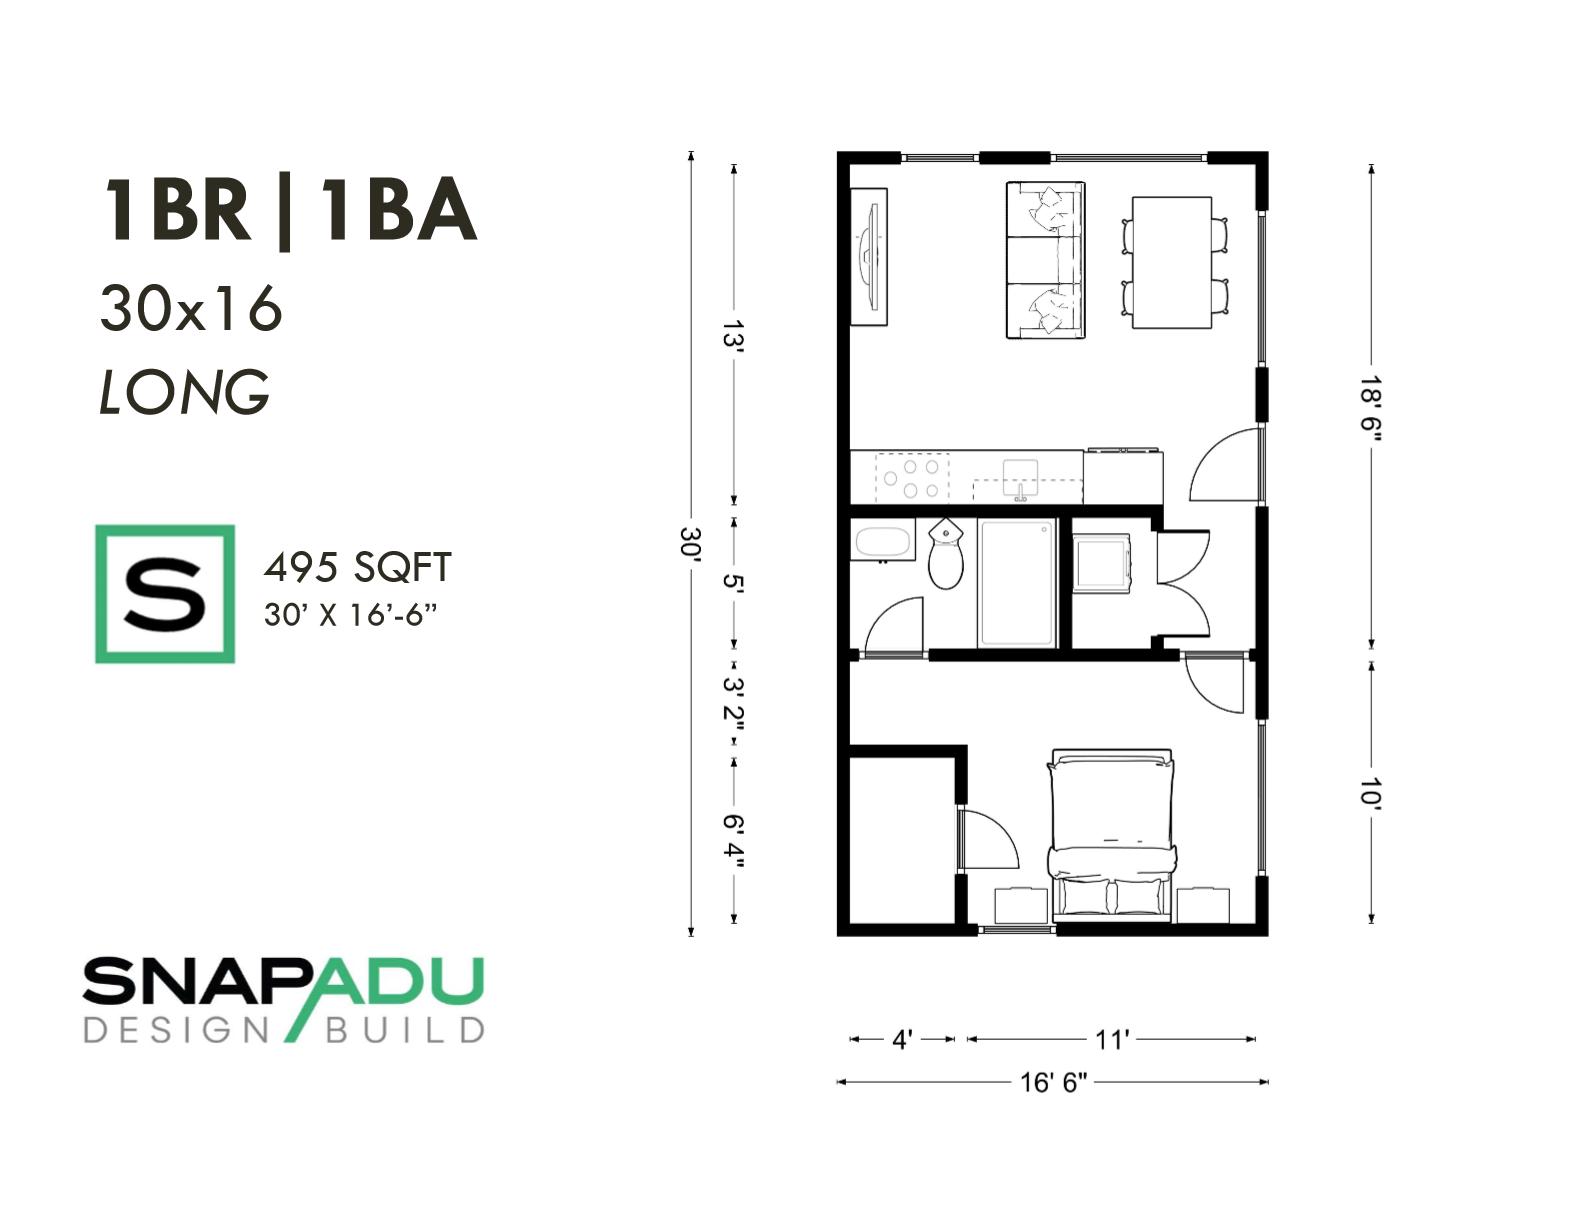 1BR 1BA 500 sqft 30x16 LONG ADU floor plan